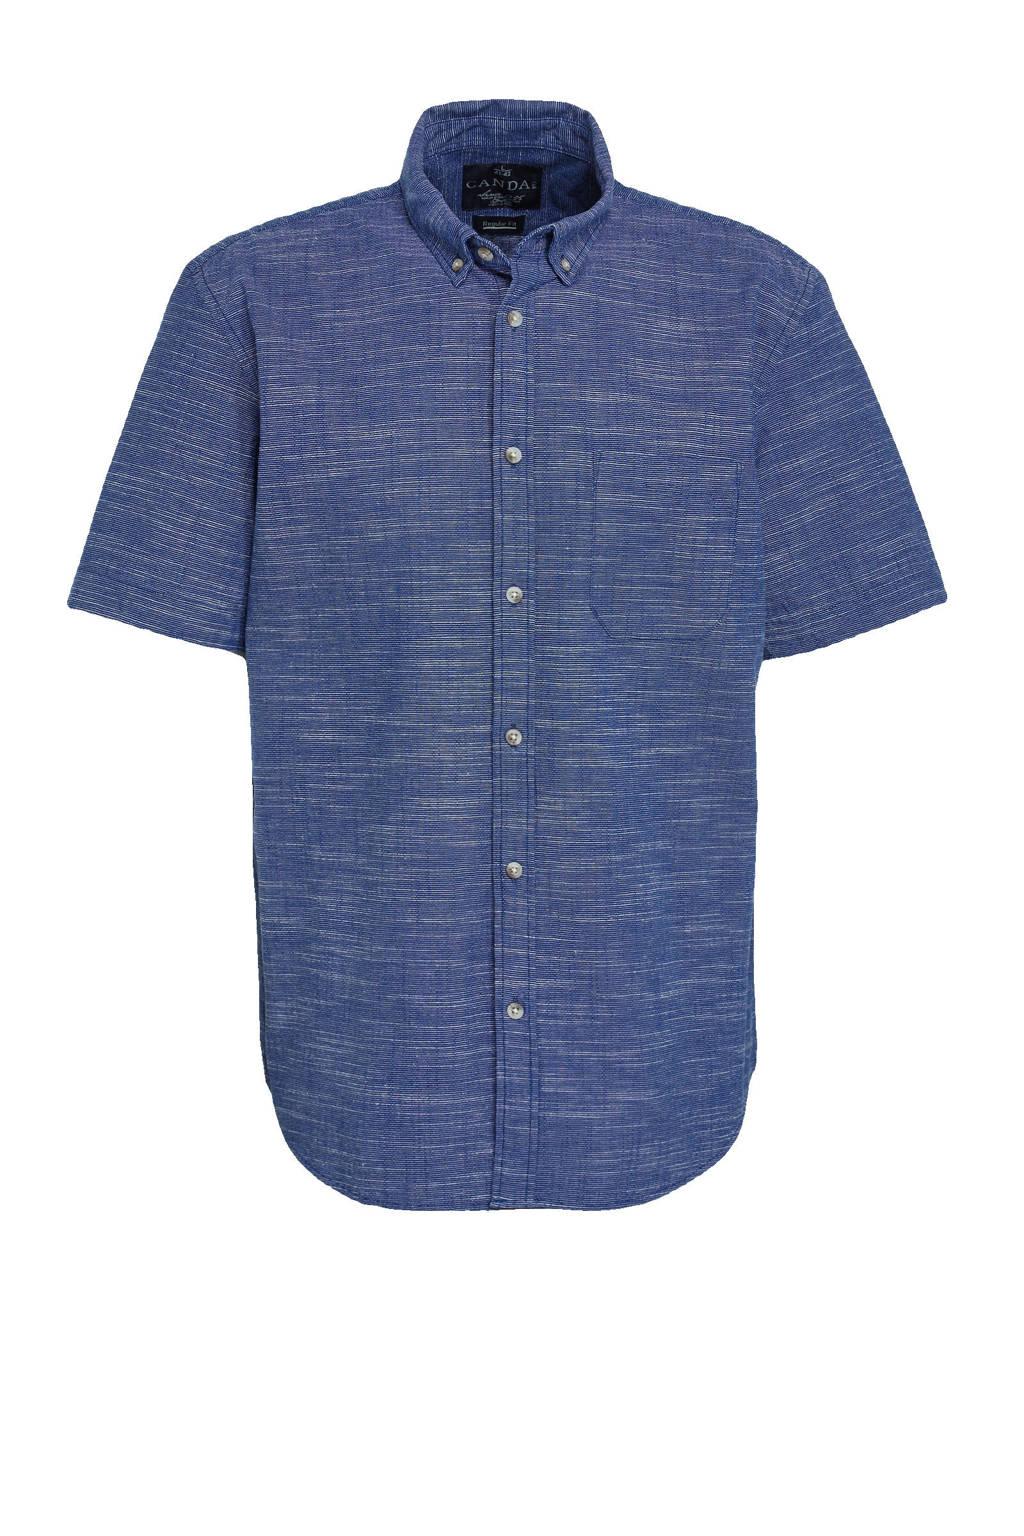 C&A Canda regular fit overhemd blauw, Donkerblauw